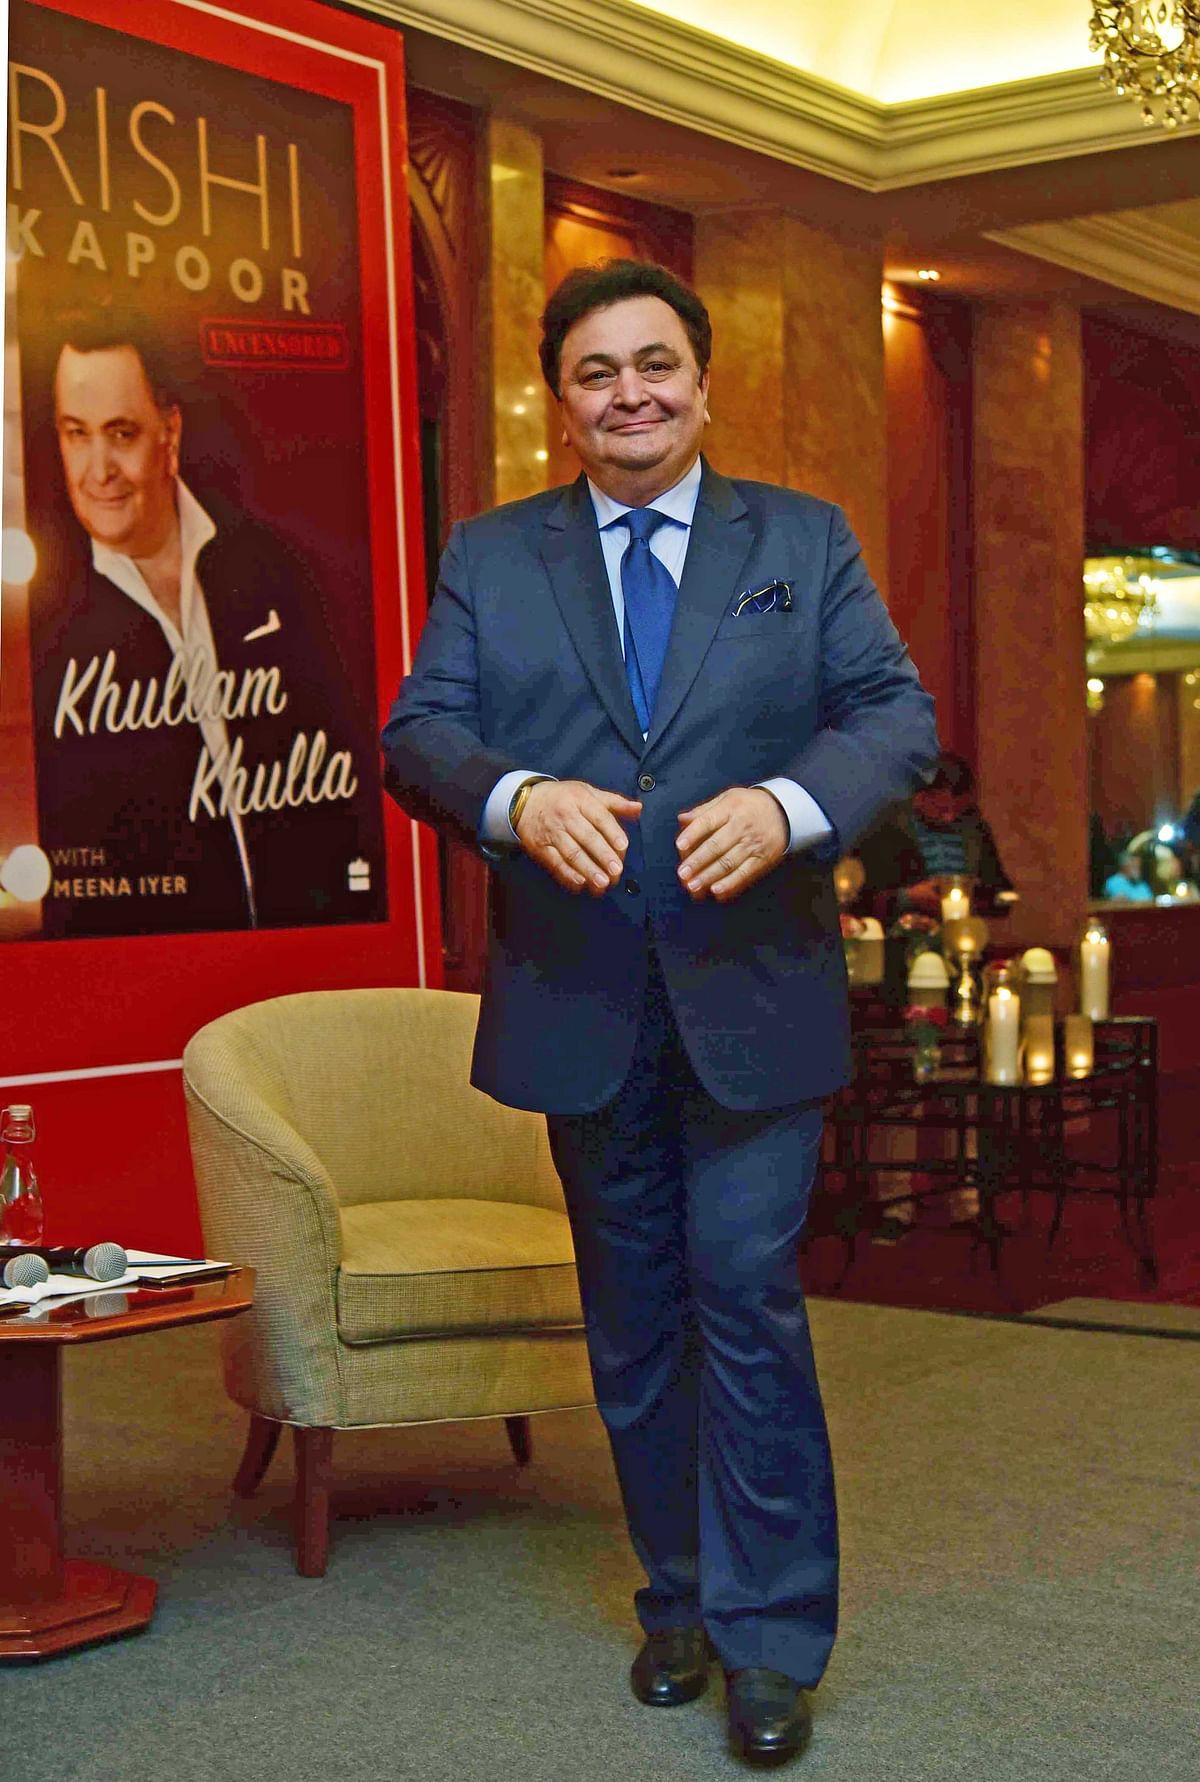 Rishi Kapoor launches his biography. (Photo: Yogen Shah)